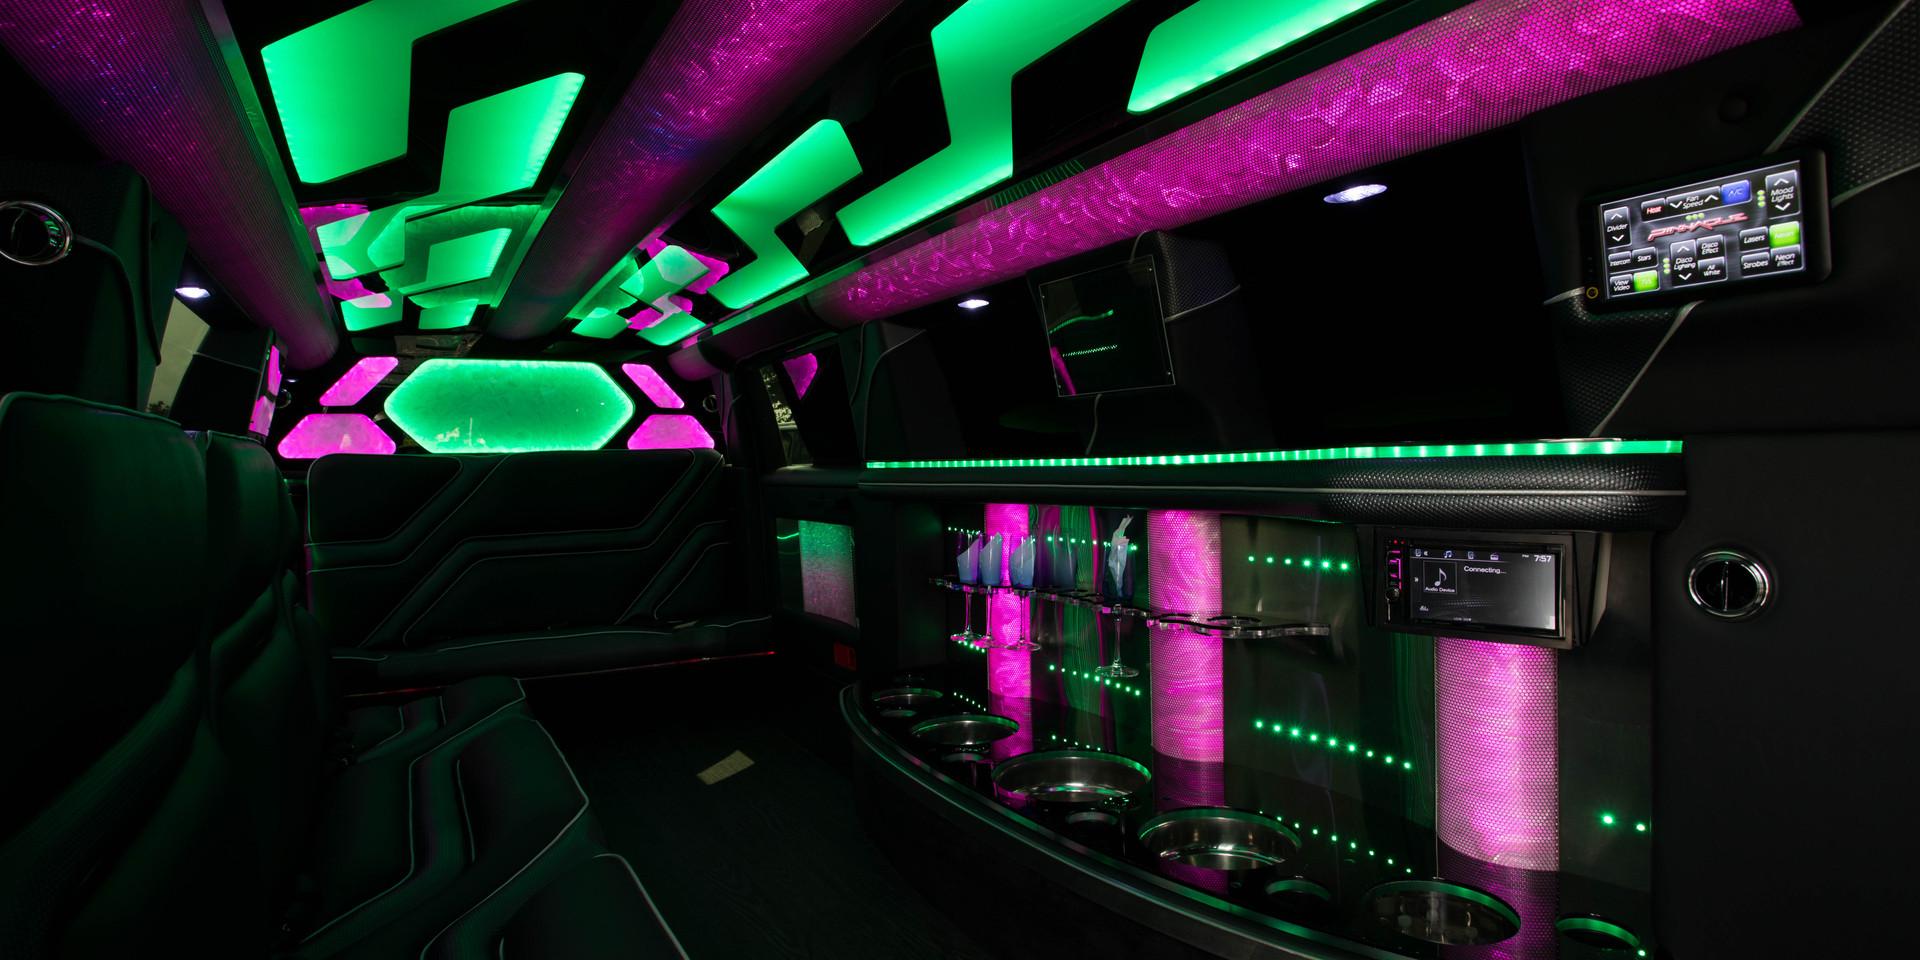 Jeep Limo Interior 6